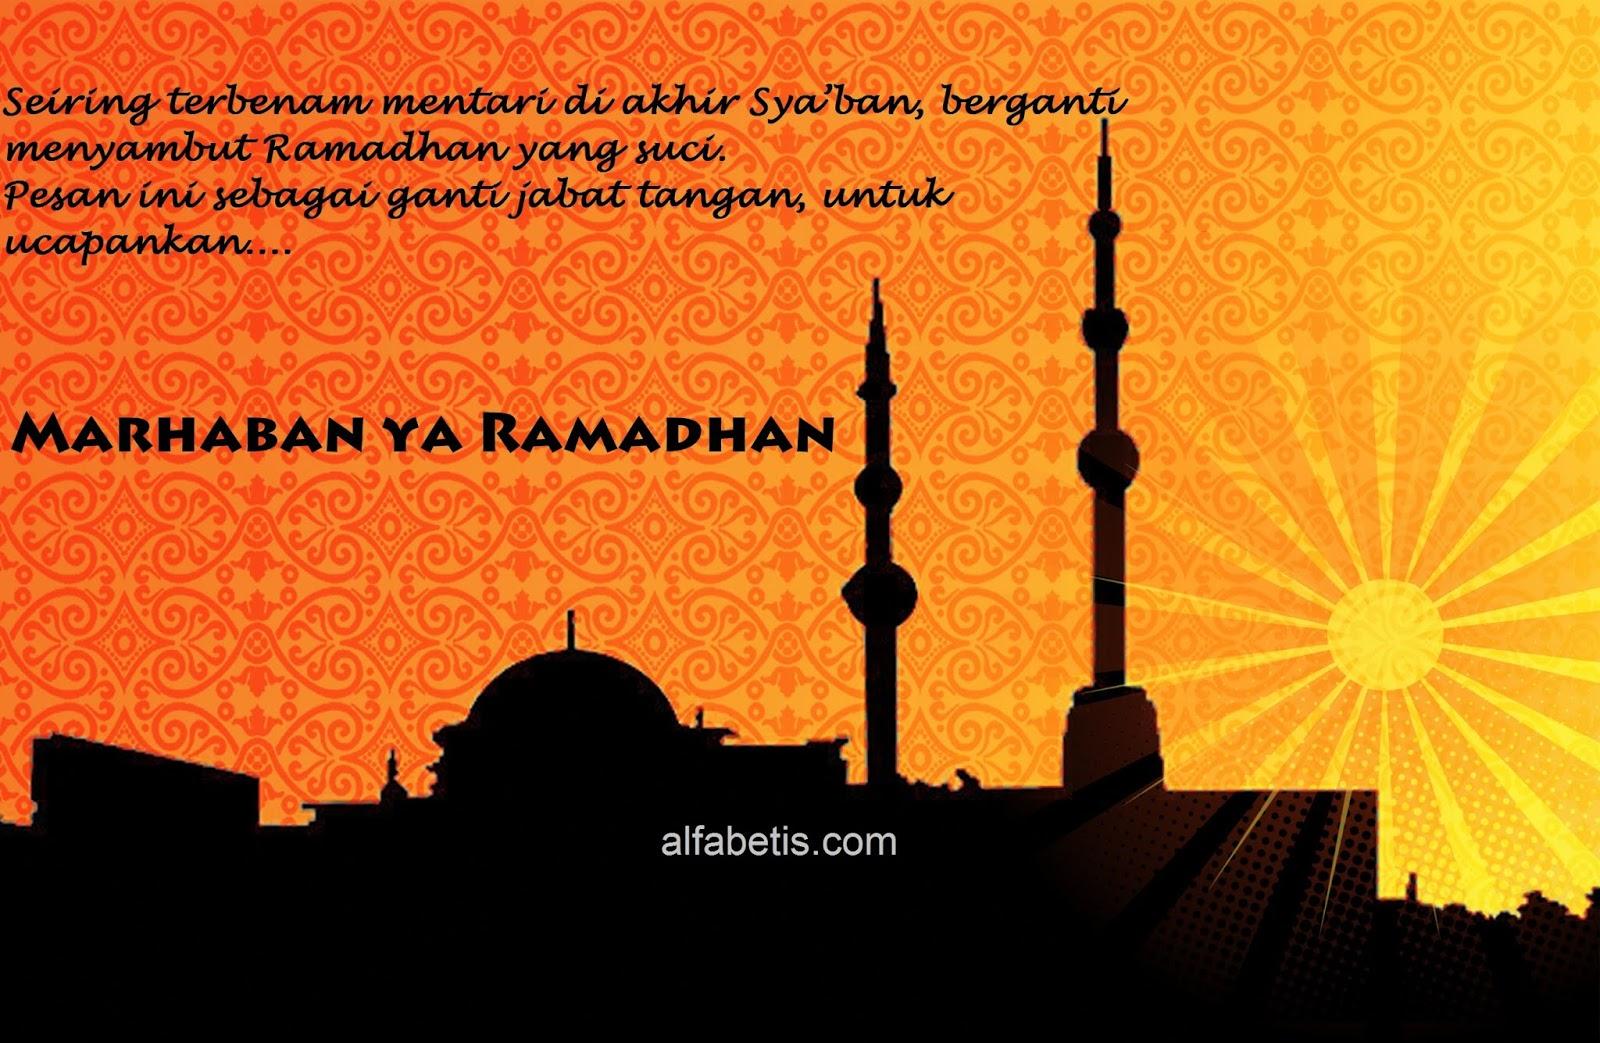 Kartu Ucapan Marhaban Ya Ramadhan Terbaru